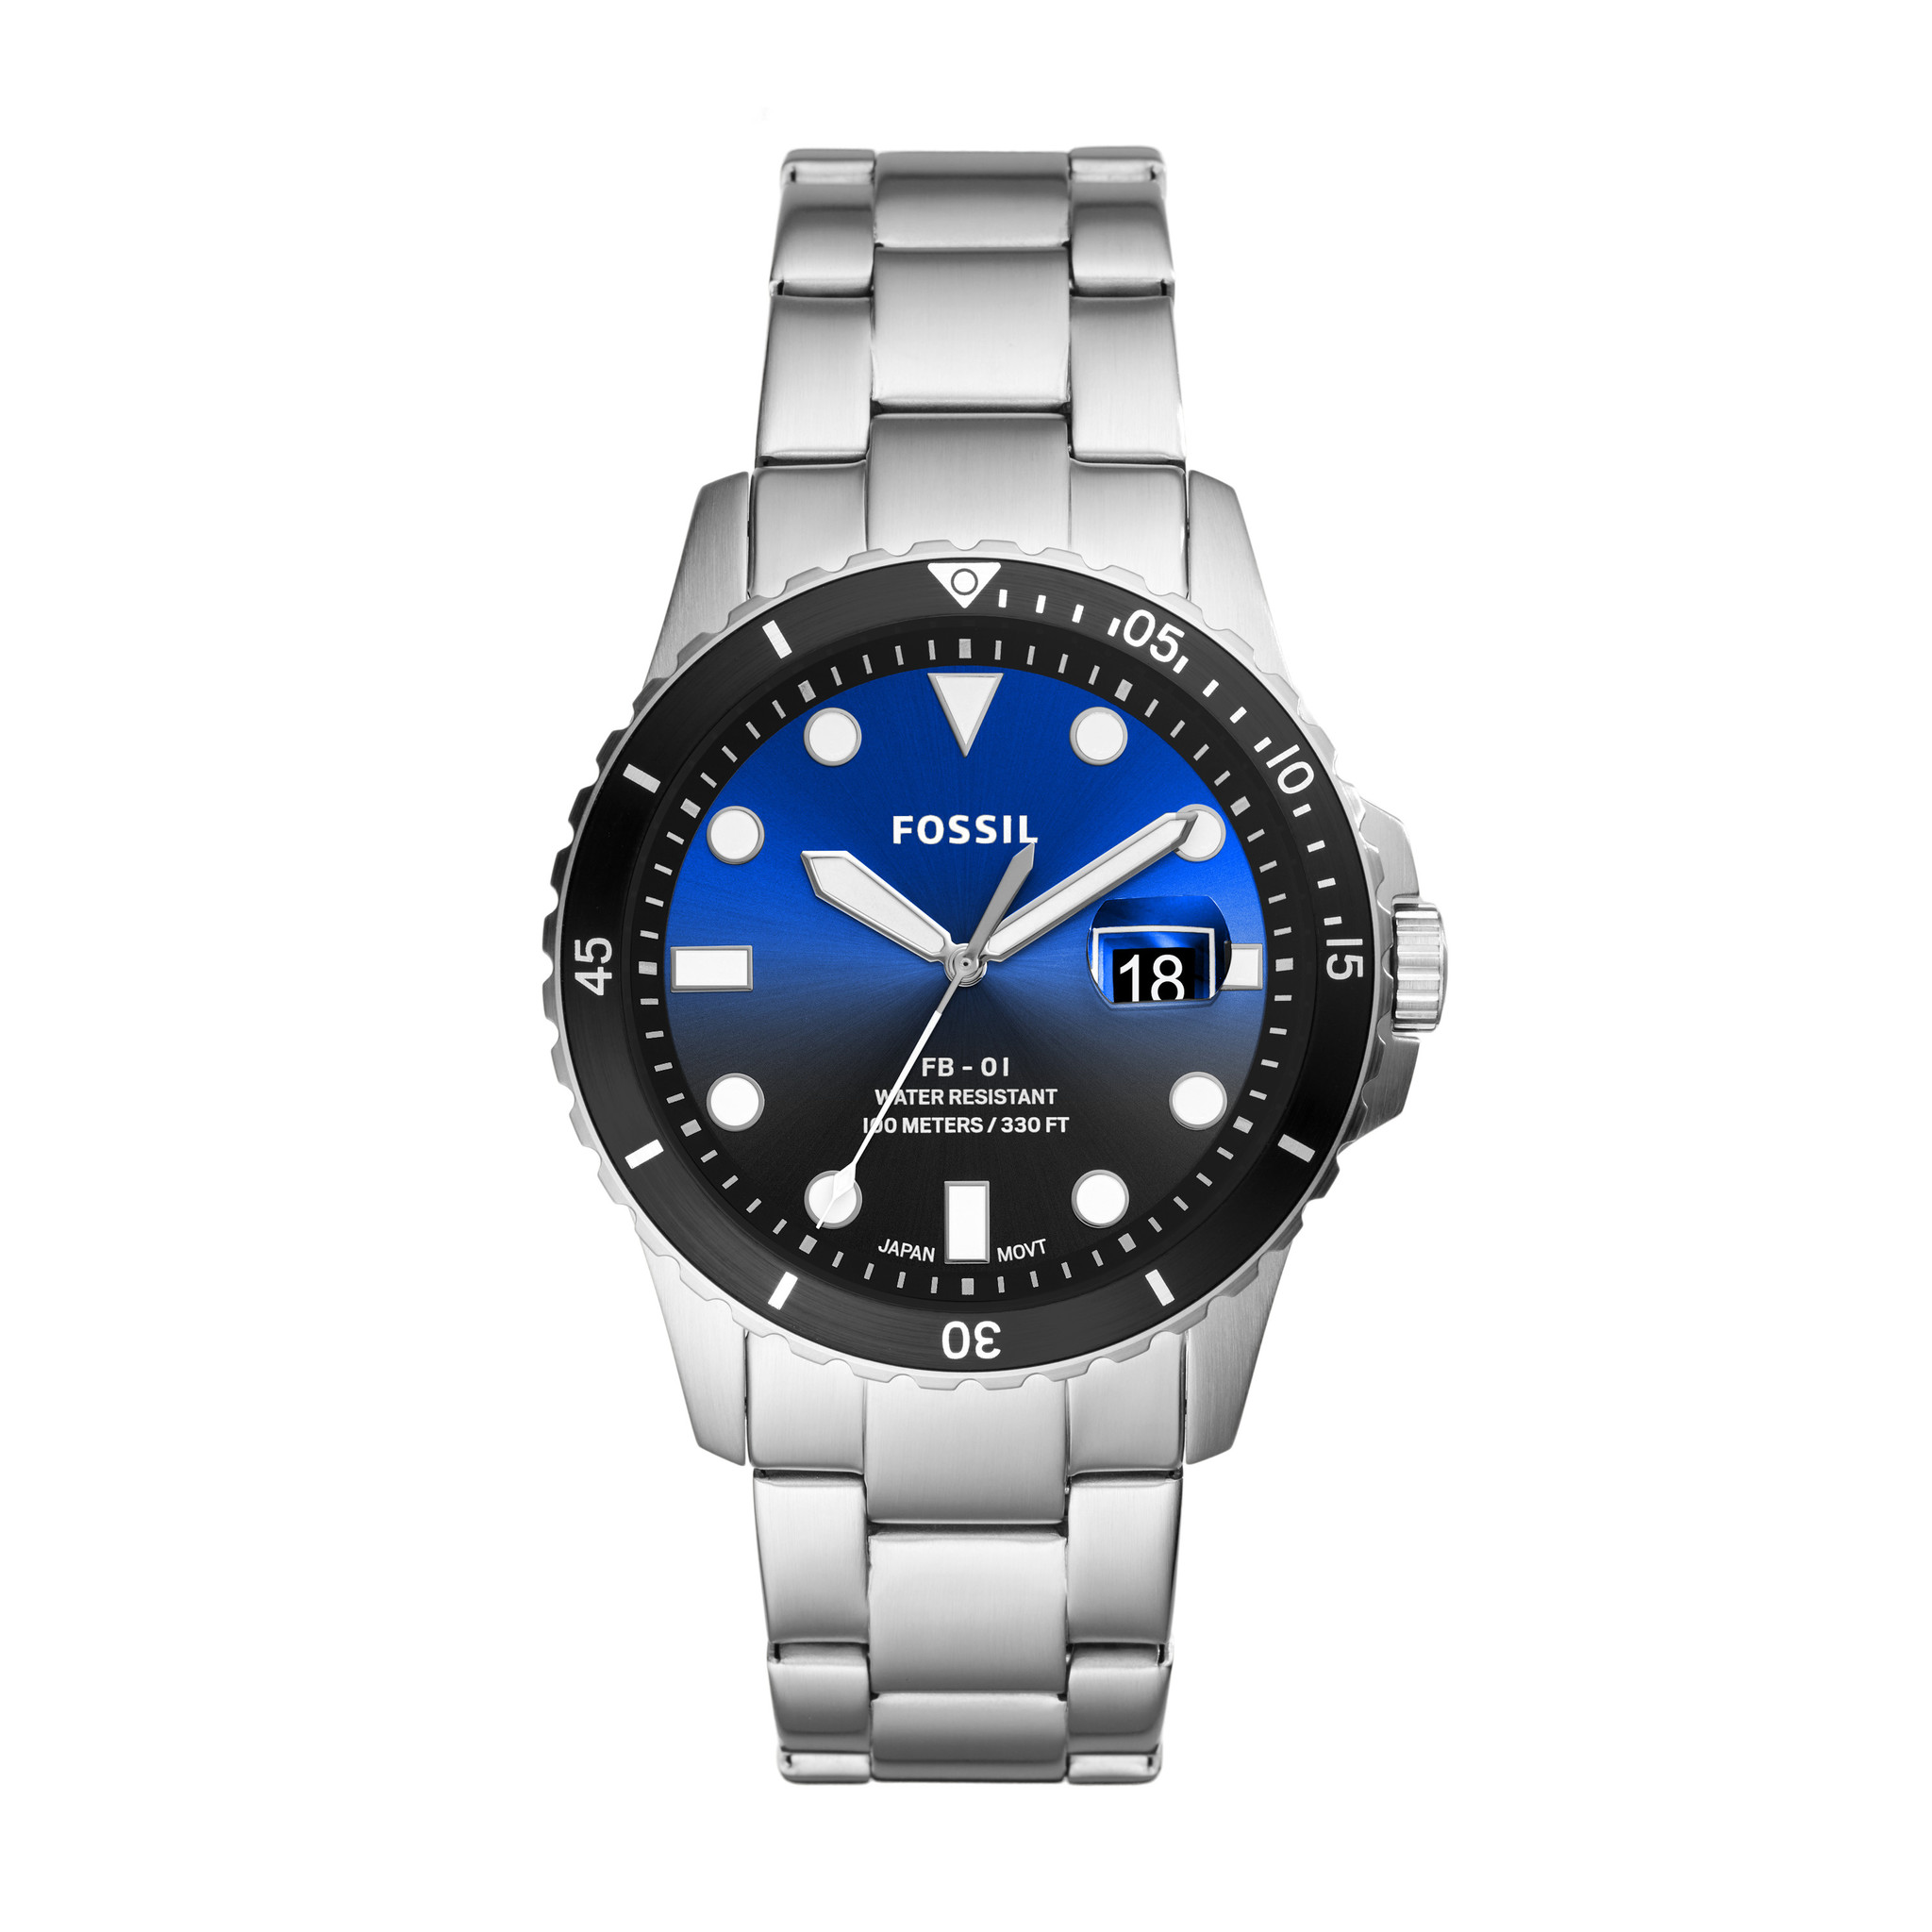 Fossil Heren Horloge Fb - 01 FS5668-1